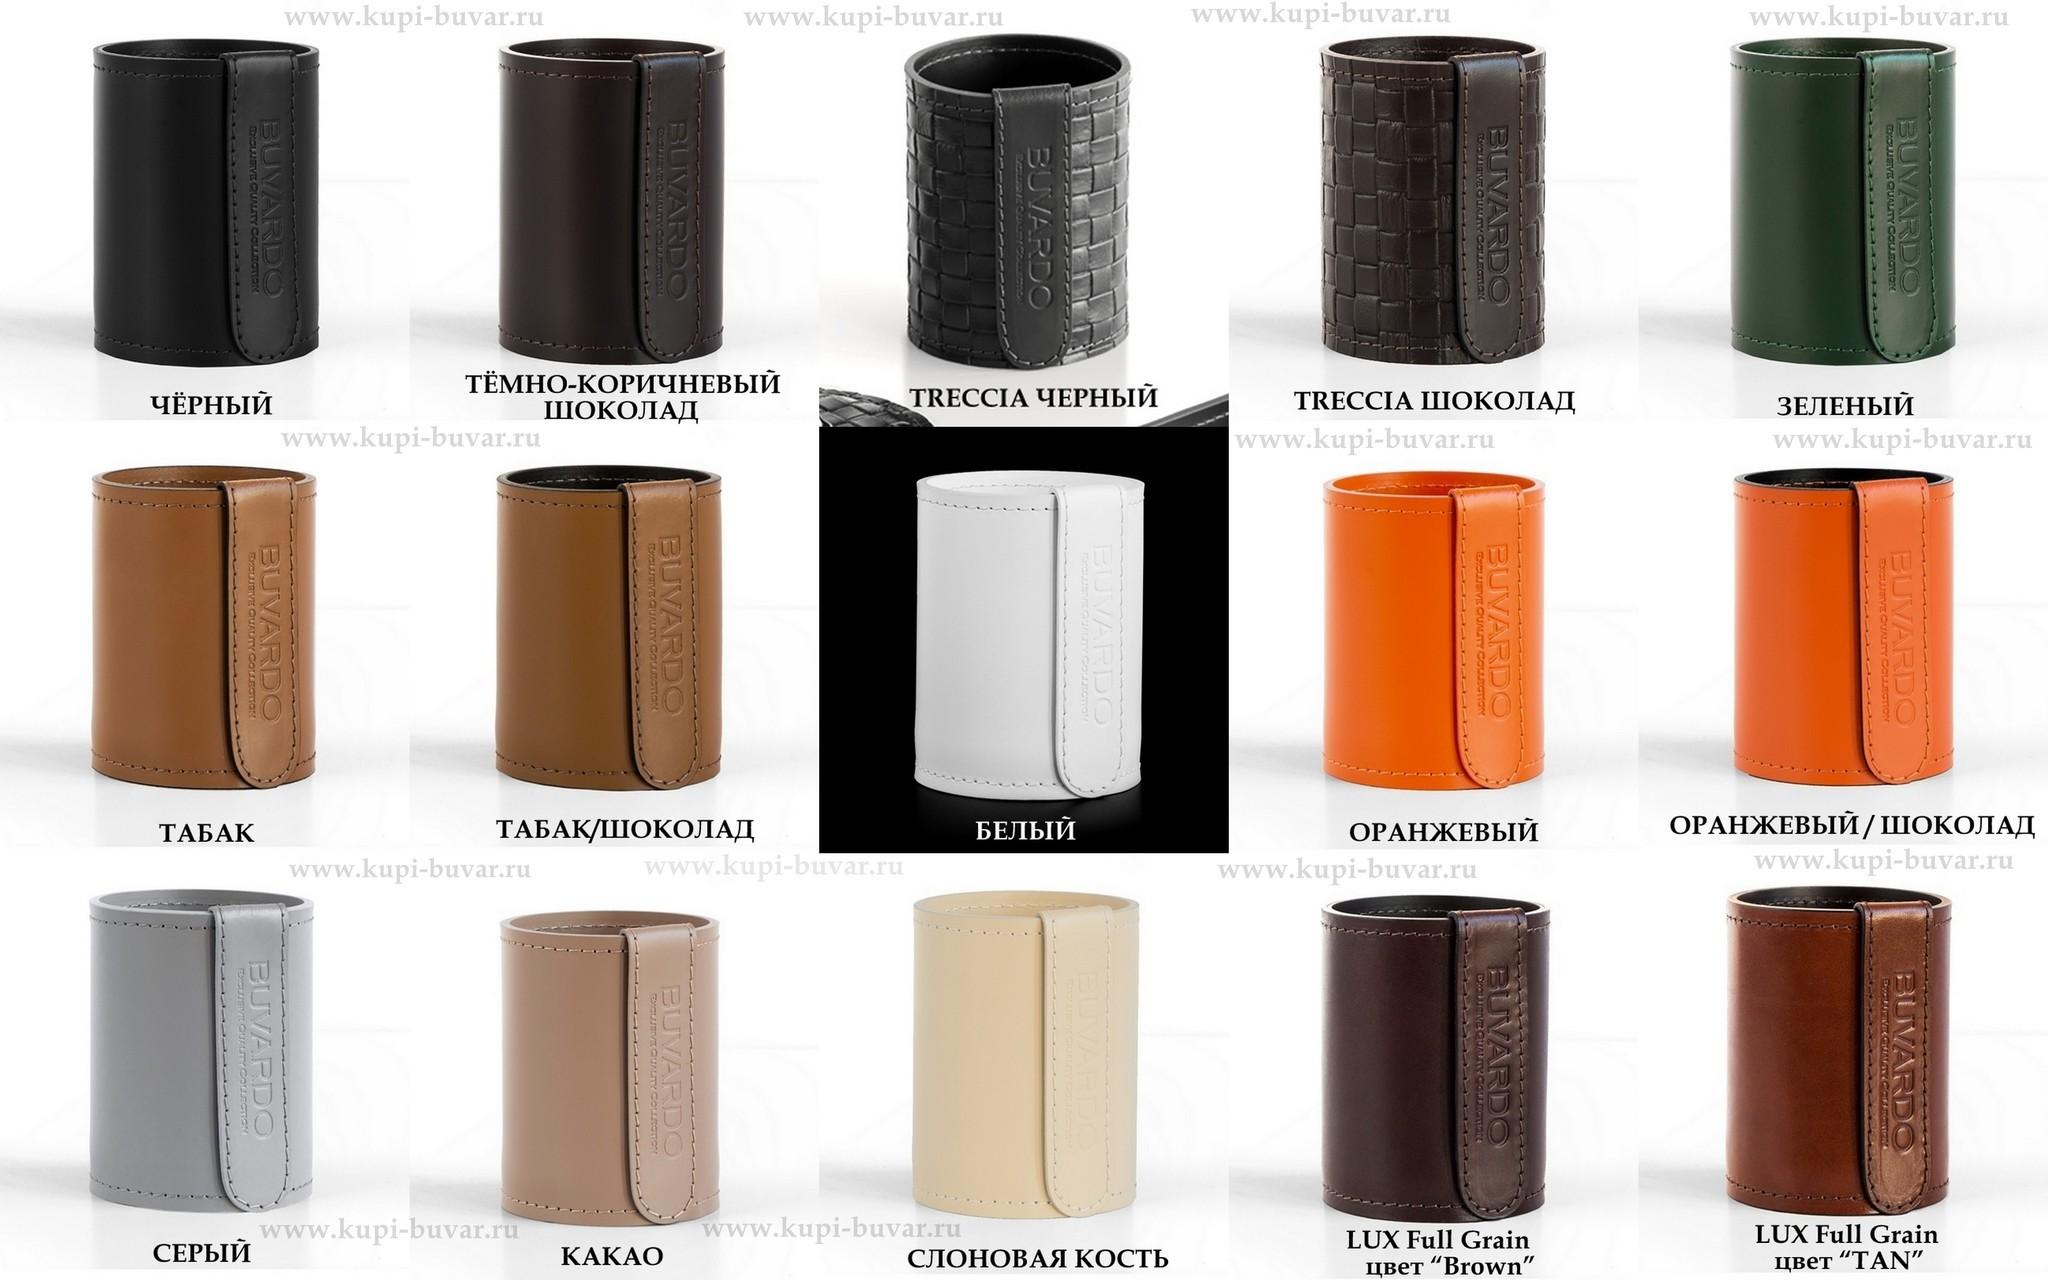 Варианты цвета кожи Cuoietto для набора 9012 4 предмета.